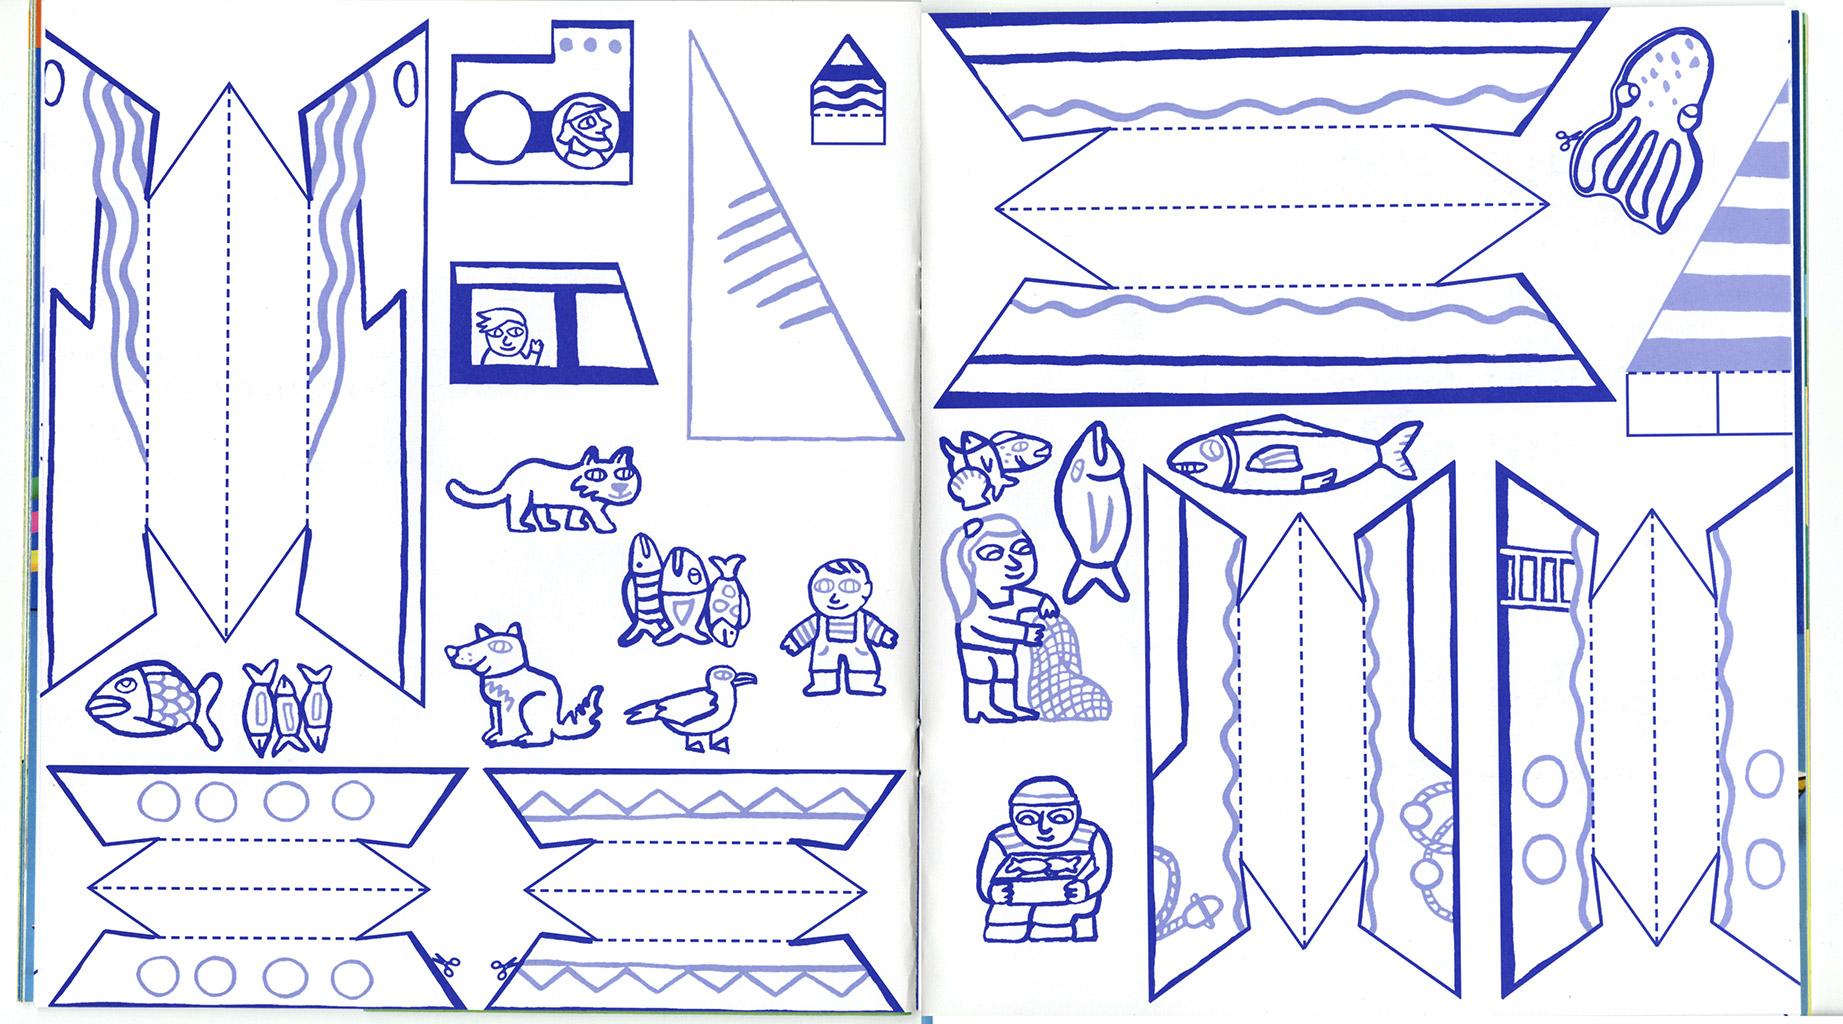 Pomme d'api petit port Magali Bardos pêcheur bleu poisson jeu maquette Bayard presse coloriage